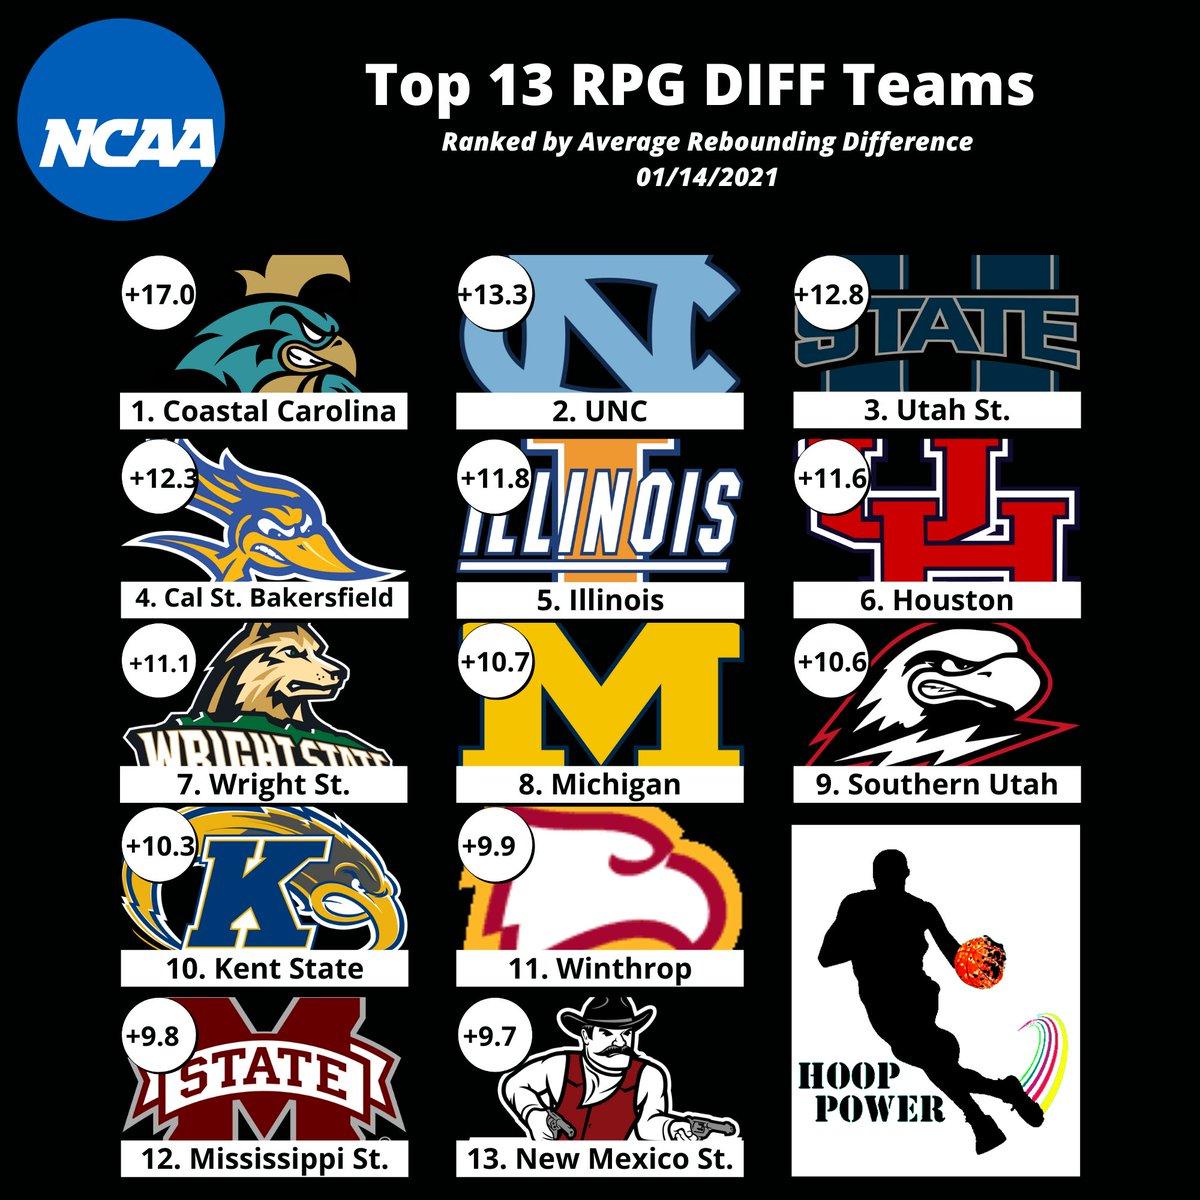 Top 13 teams in terms of RPG differential:  @CoastalMBB @UNC_Basketball @USUBasketball @CSUB_MBB @IlliniMBB @UHCougarMBK @WSUCougarMBB @umichbball @SUUBasketball @KentStMBB @Winthrop_MBB @HailStateMBK @NMStateMBB  #NCAABasketball #NCAAM #NCAAB #CollegeBasketball #CollegeHoops https://t.co/rP1PG4jacG